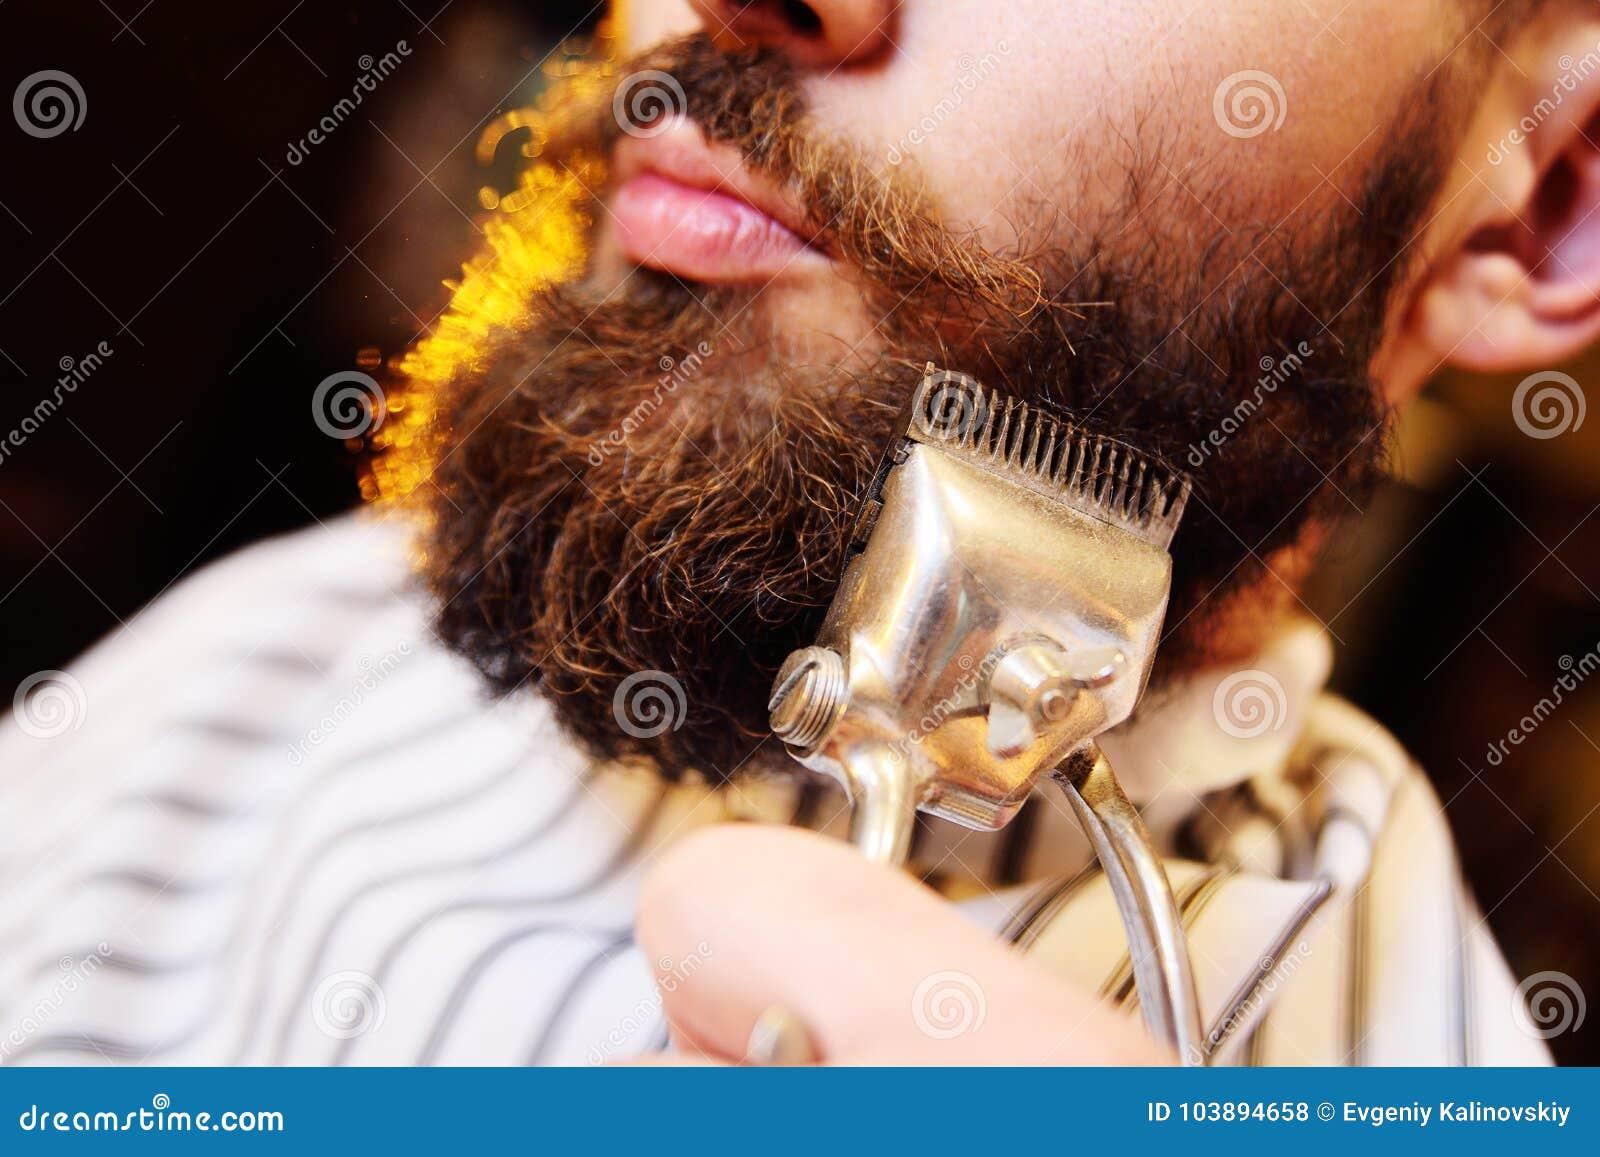 Shaving your beard in barbershop